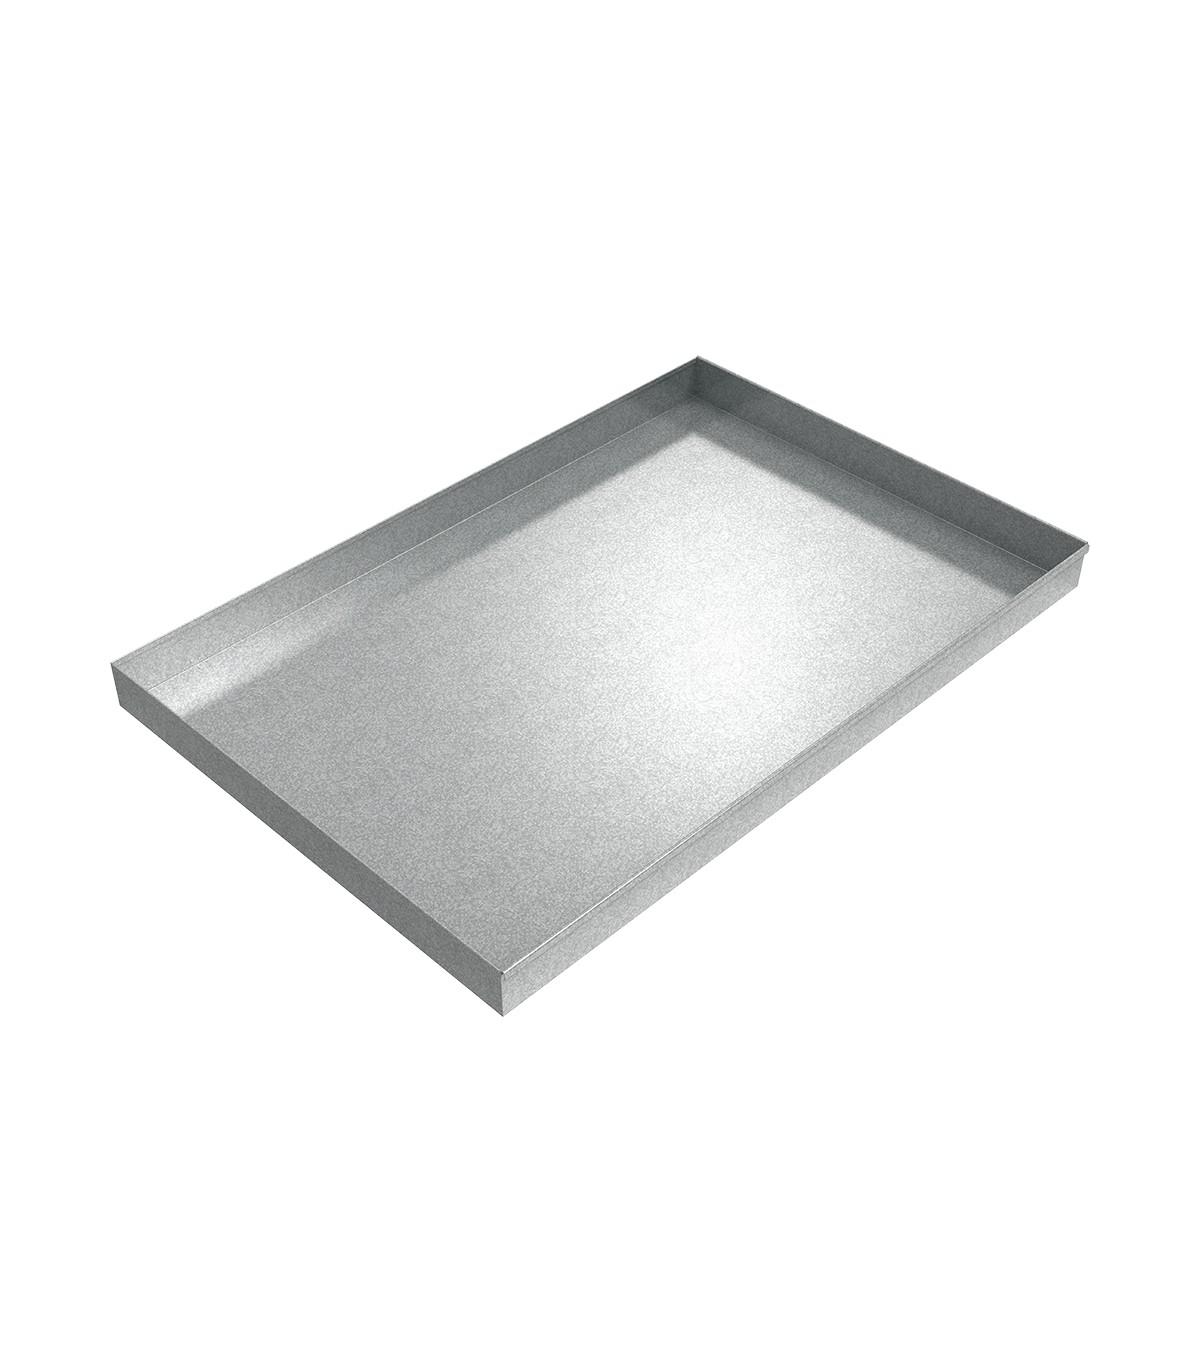 High Wall Assembly Drip Tray